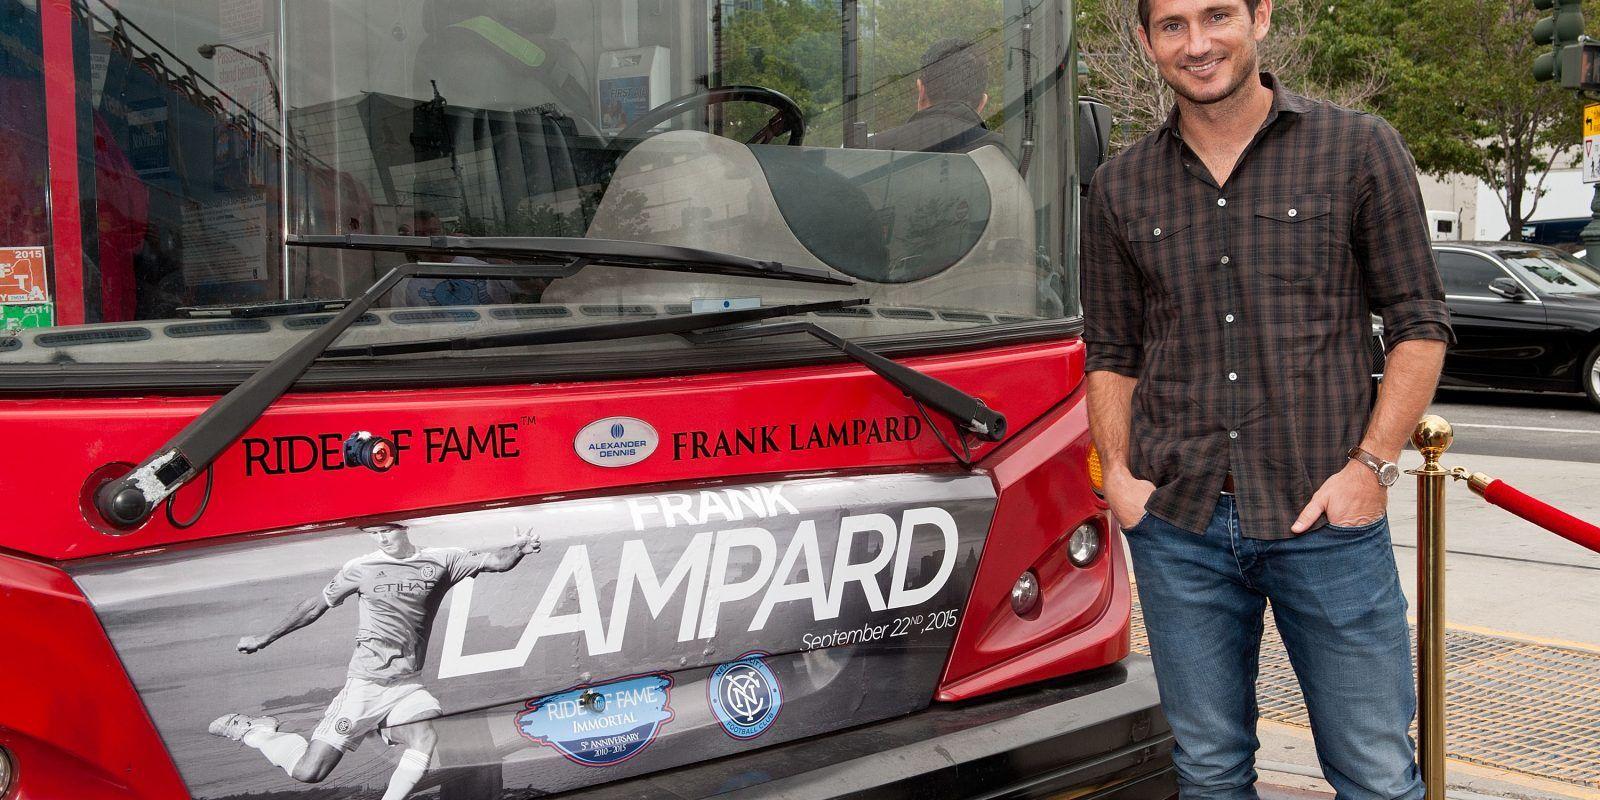 David Villa, Frank Lampard, Andrea Pirlo NYCFC Ride Of Fame Induction Ceremony. Imagen Por: